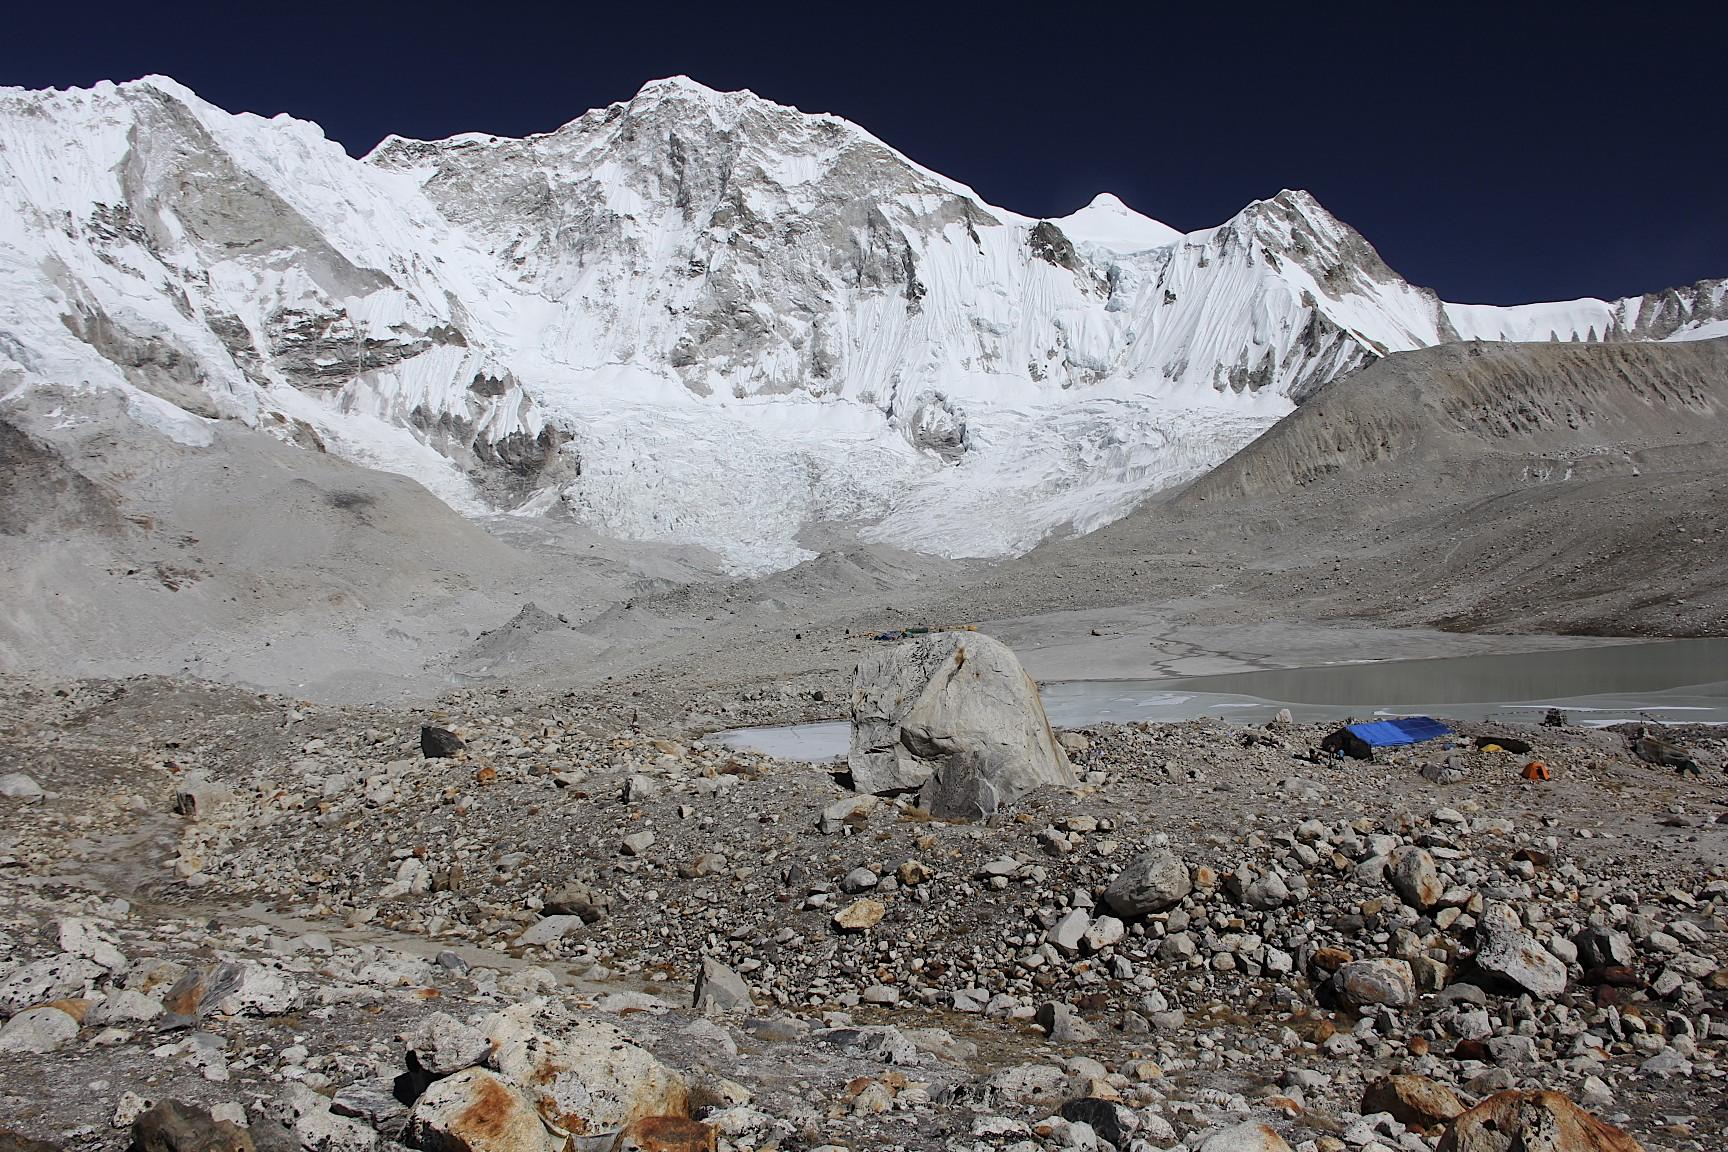 Mt. Baruntse from the Baruntse BC